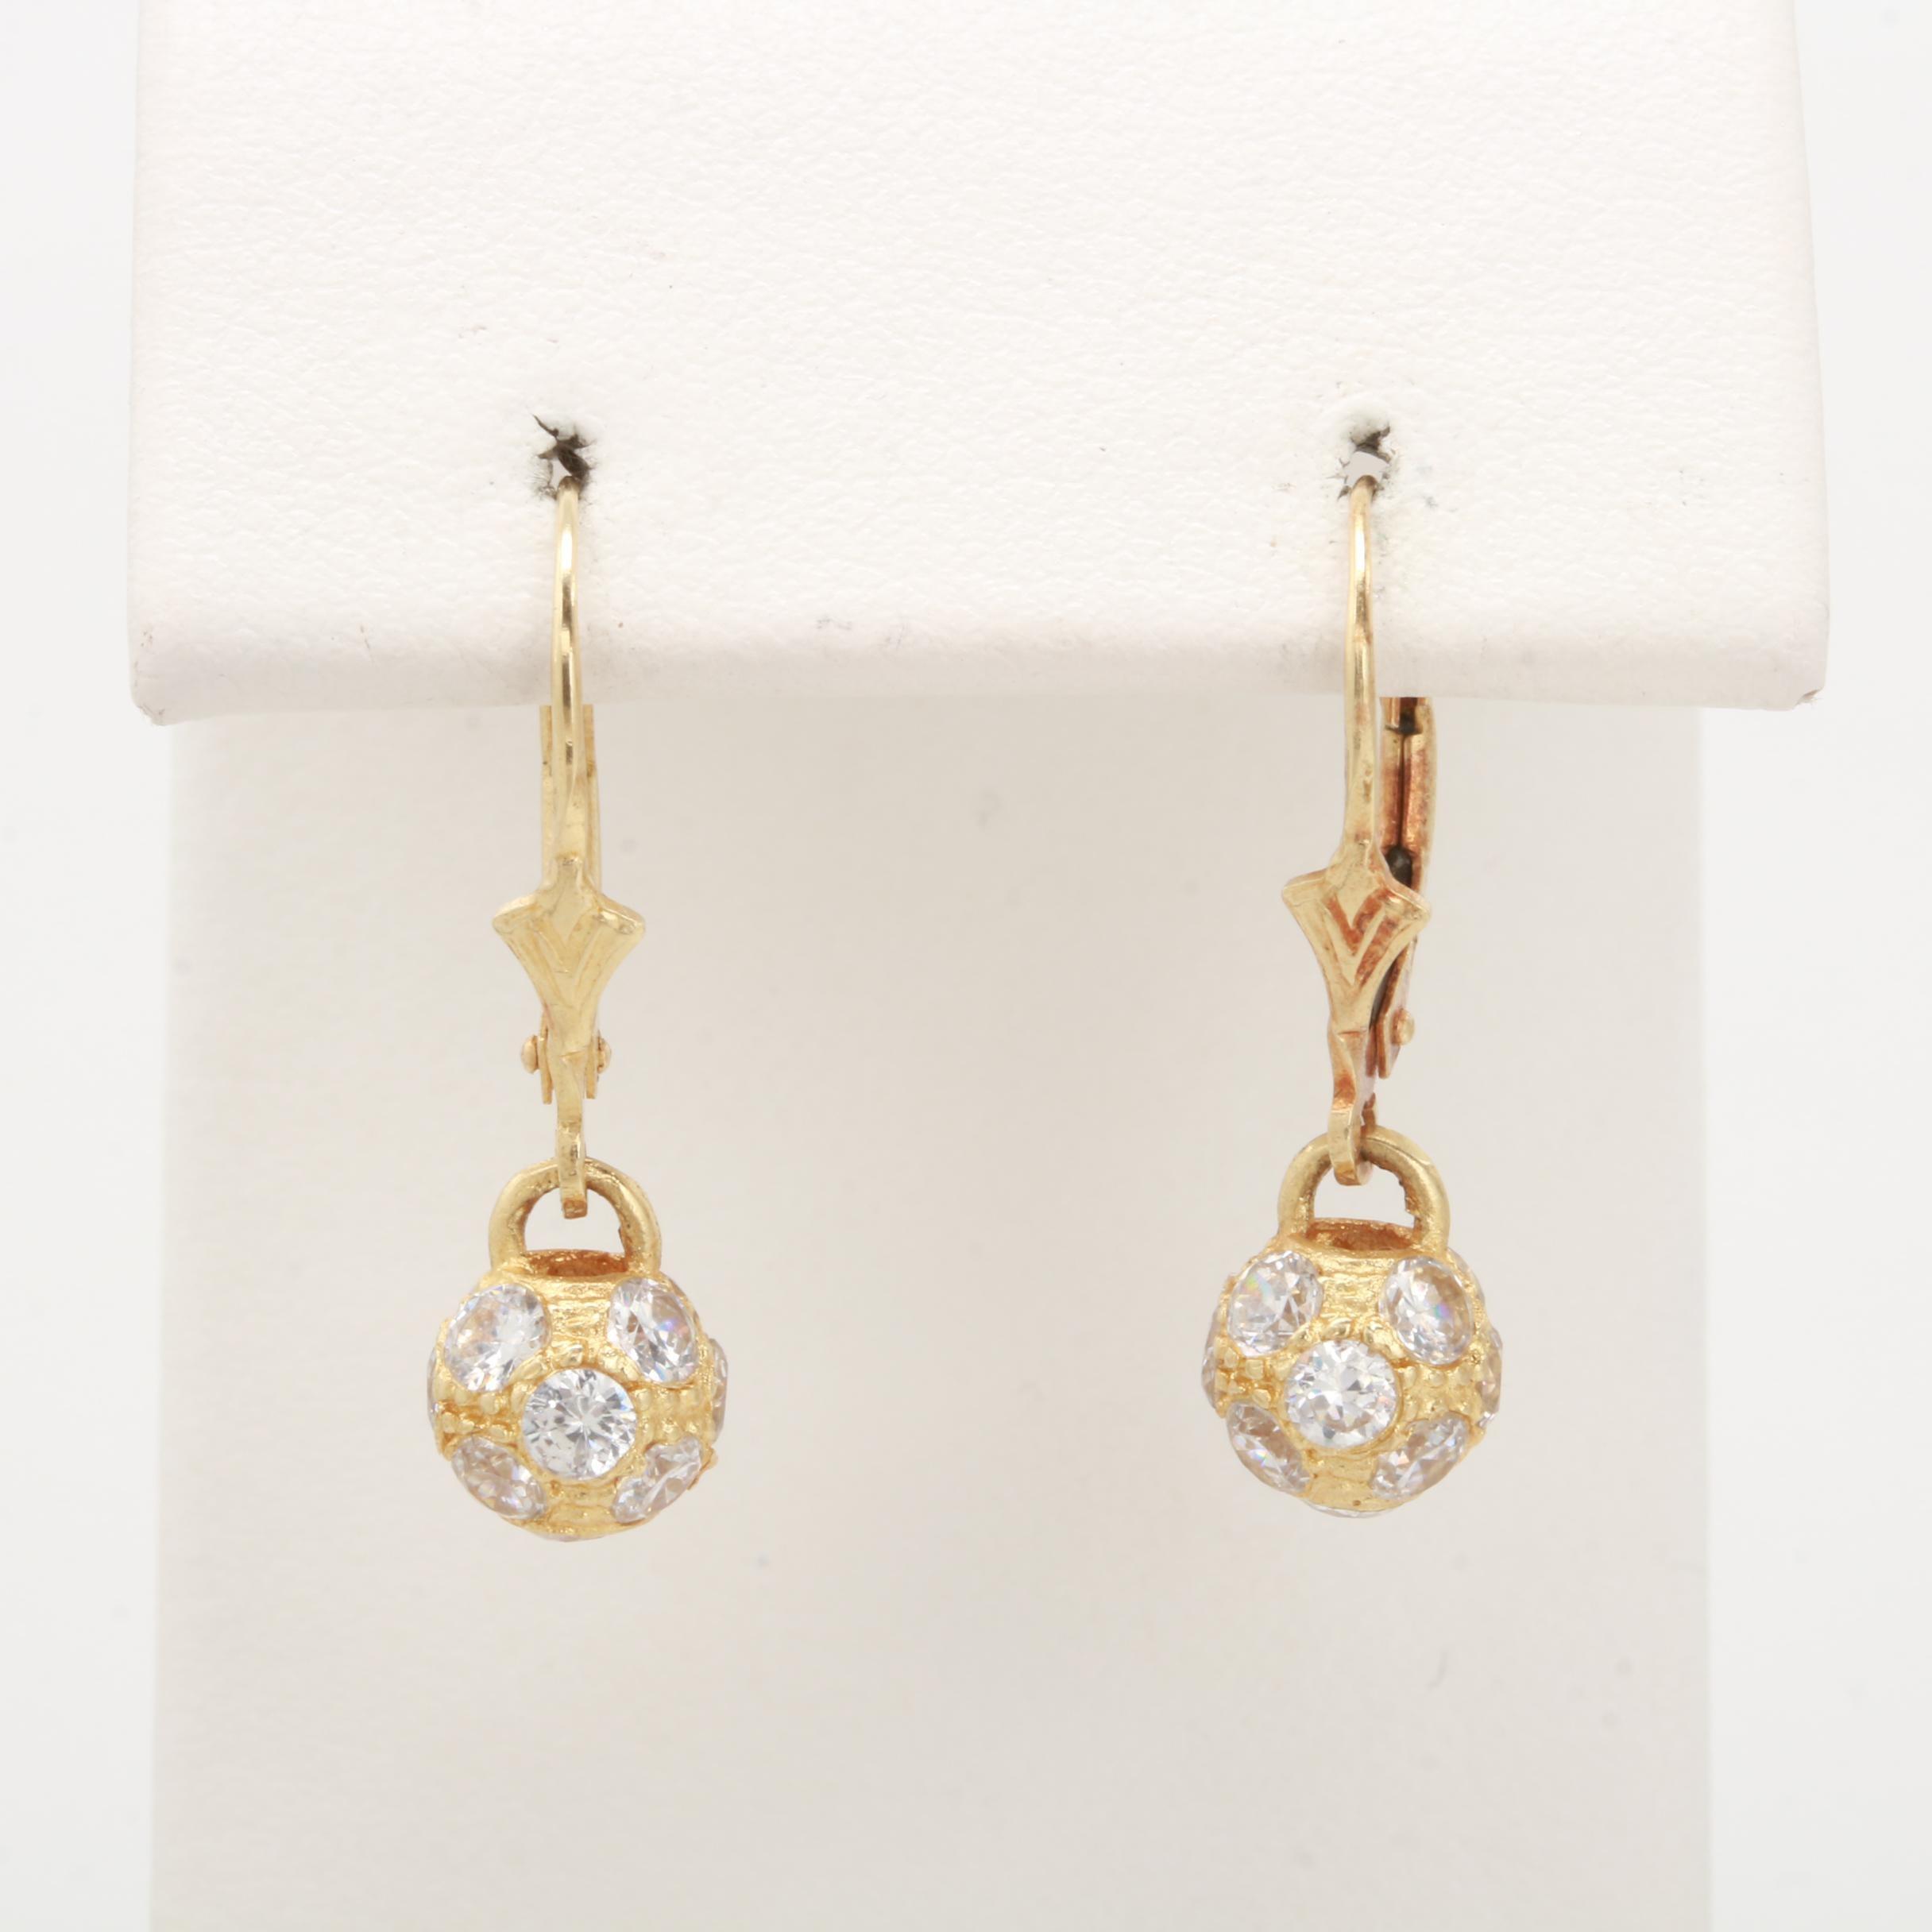 14K Yellow Gold Cubic Zirconia Dangle Earrings